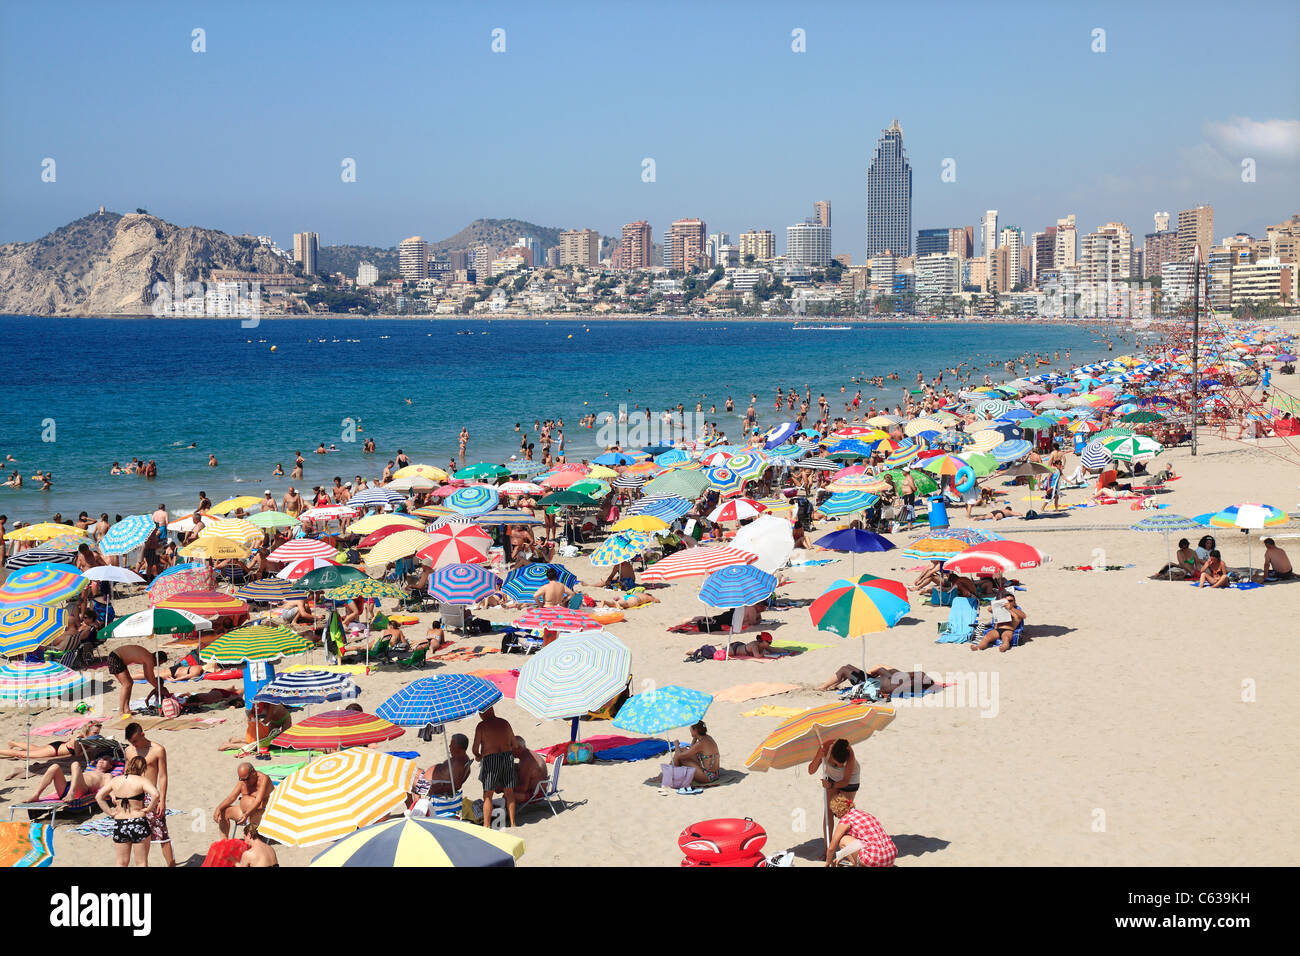 Popular Holiday Resort of Benidorm in Spain Stock Photo